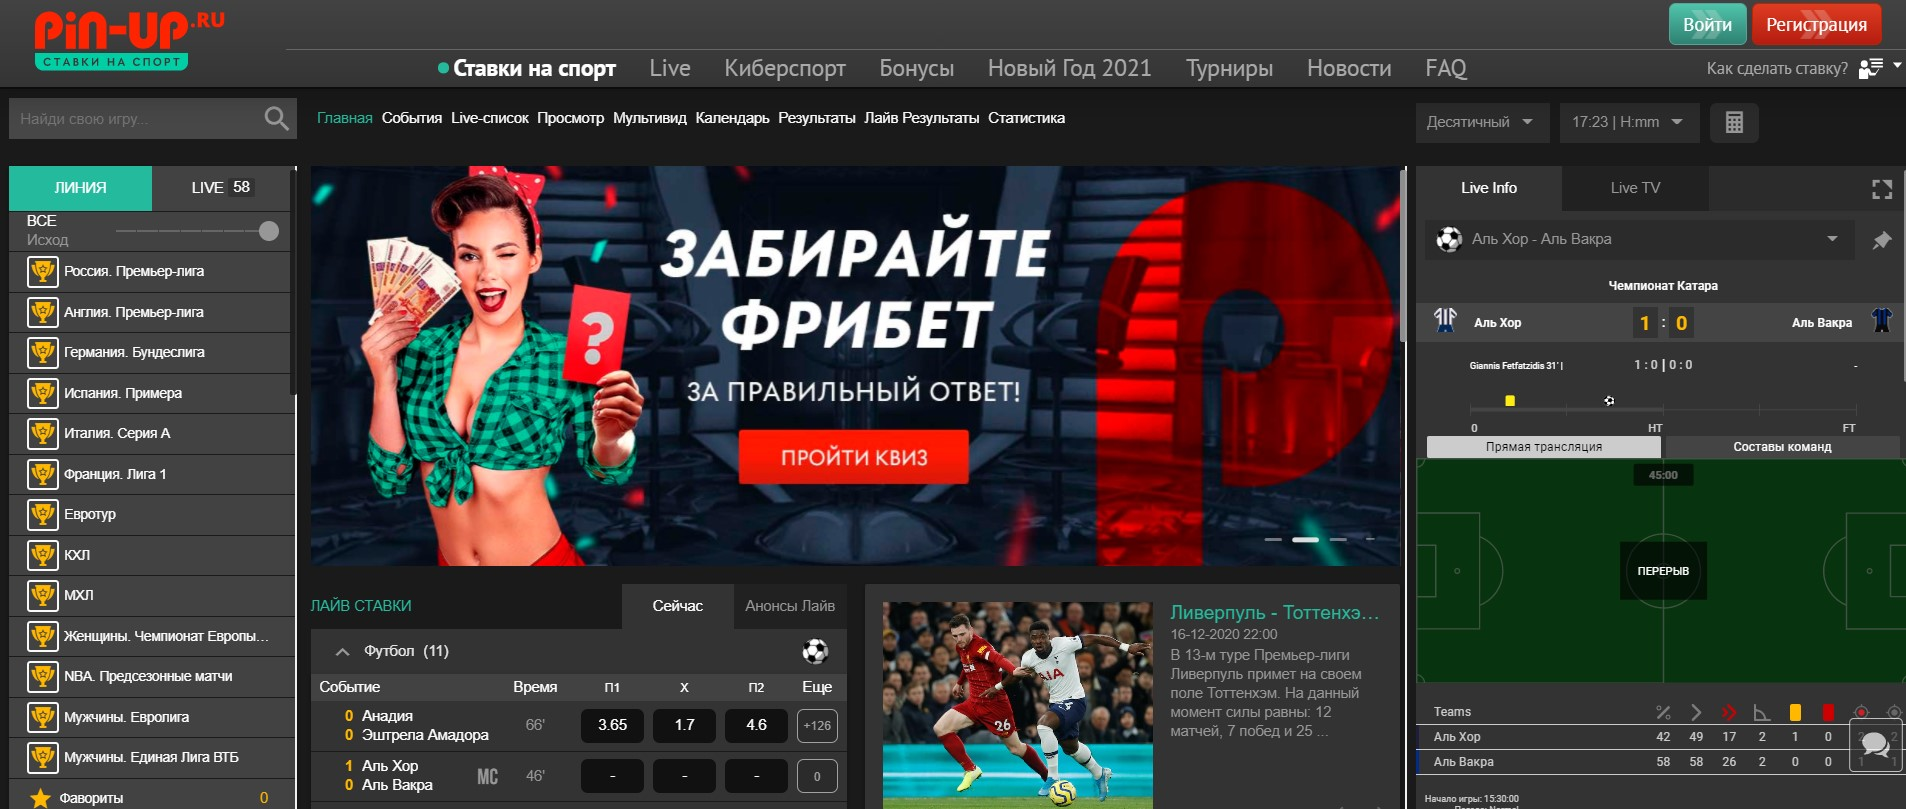 stavki na sport onlayn bukmekerskaya kontora pin up.ru